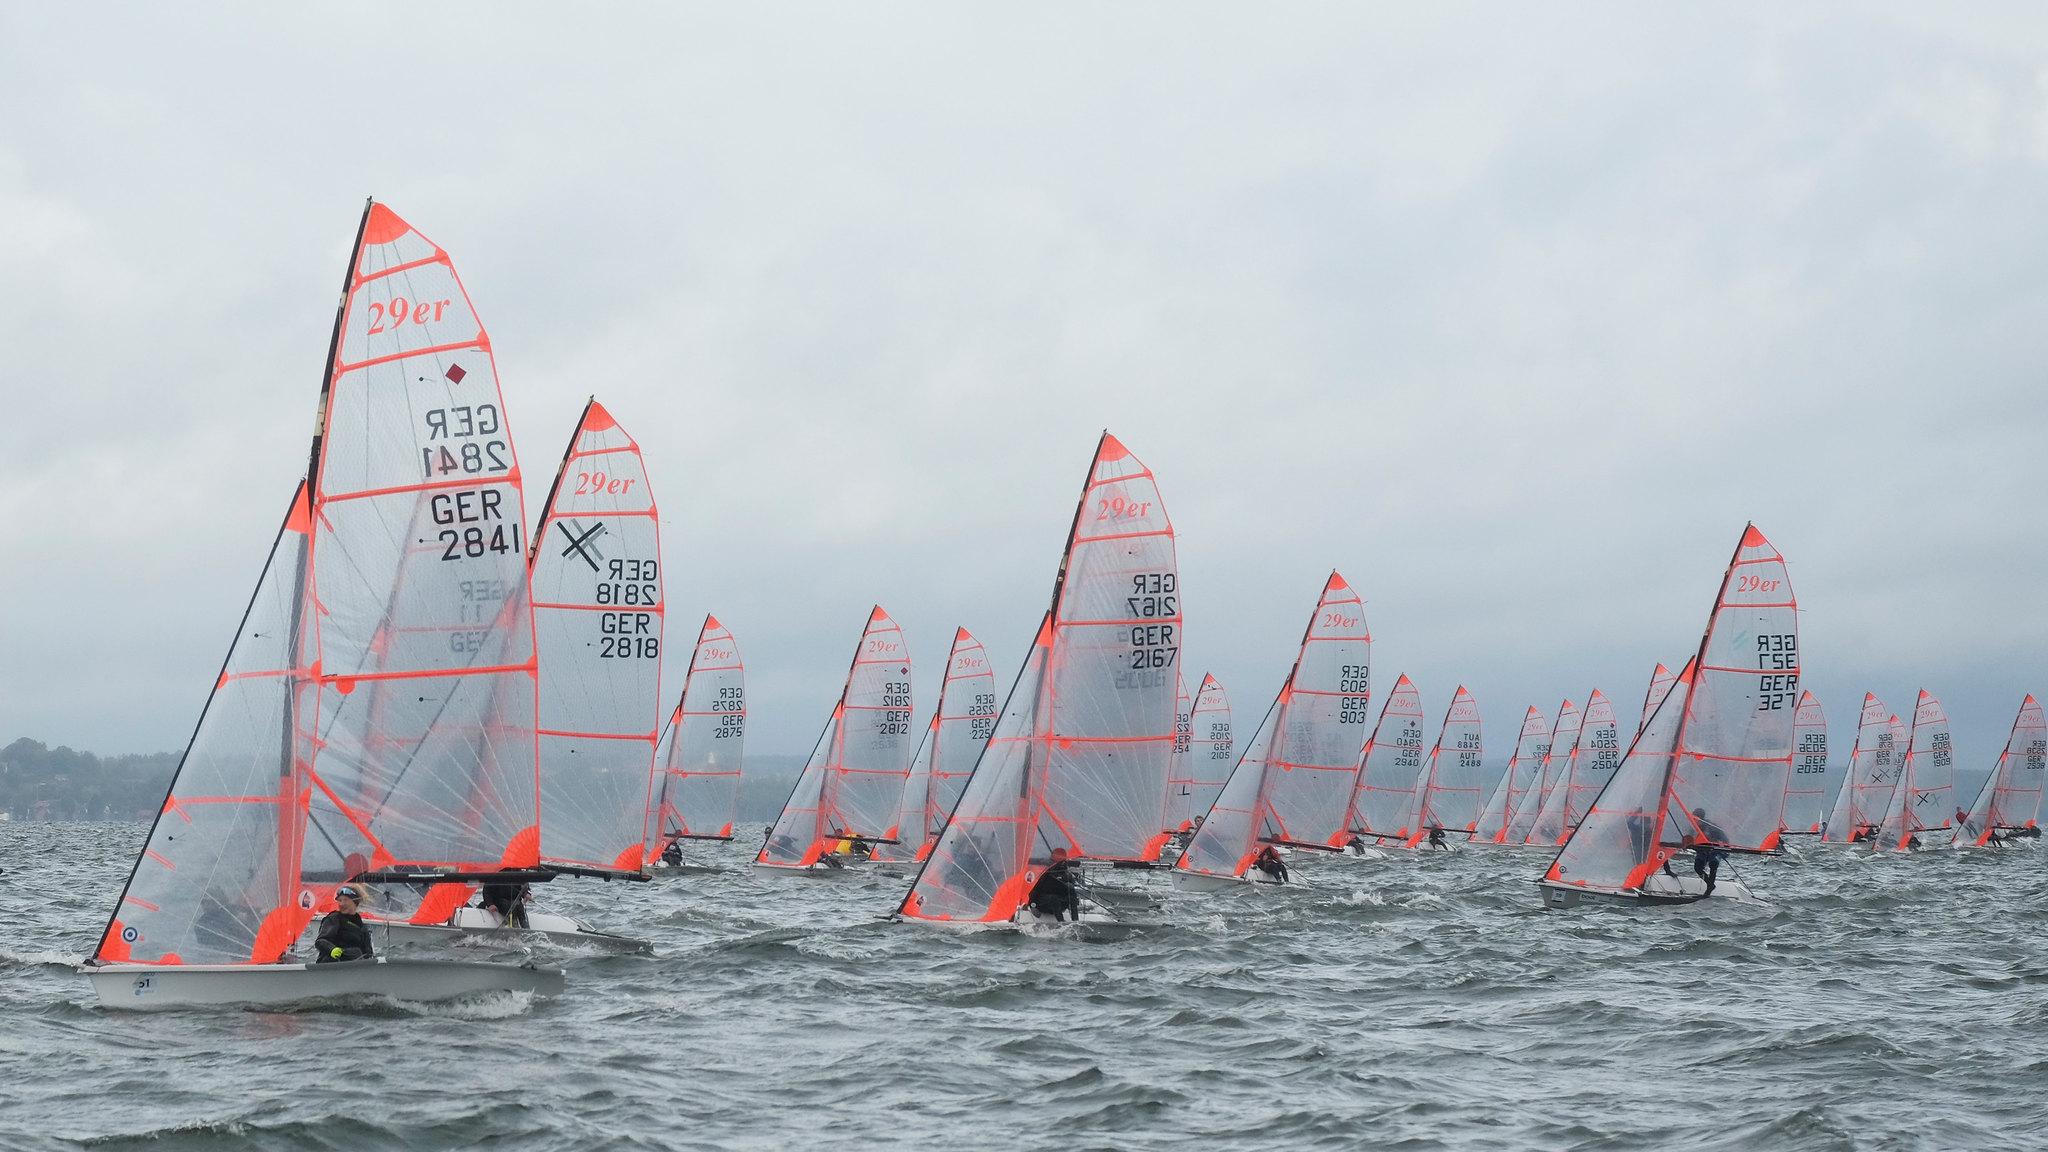 IDJM 2019 der 29er-Klasse im Diessner-Segel-Club, Tag3